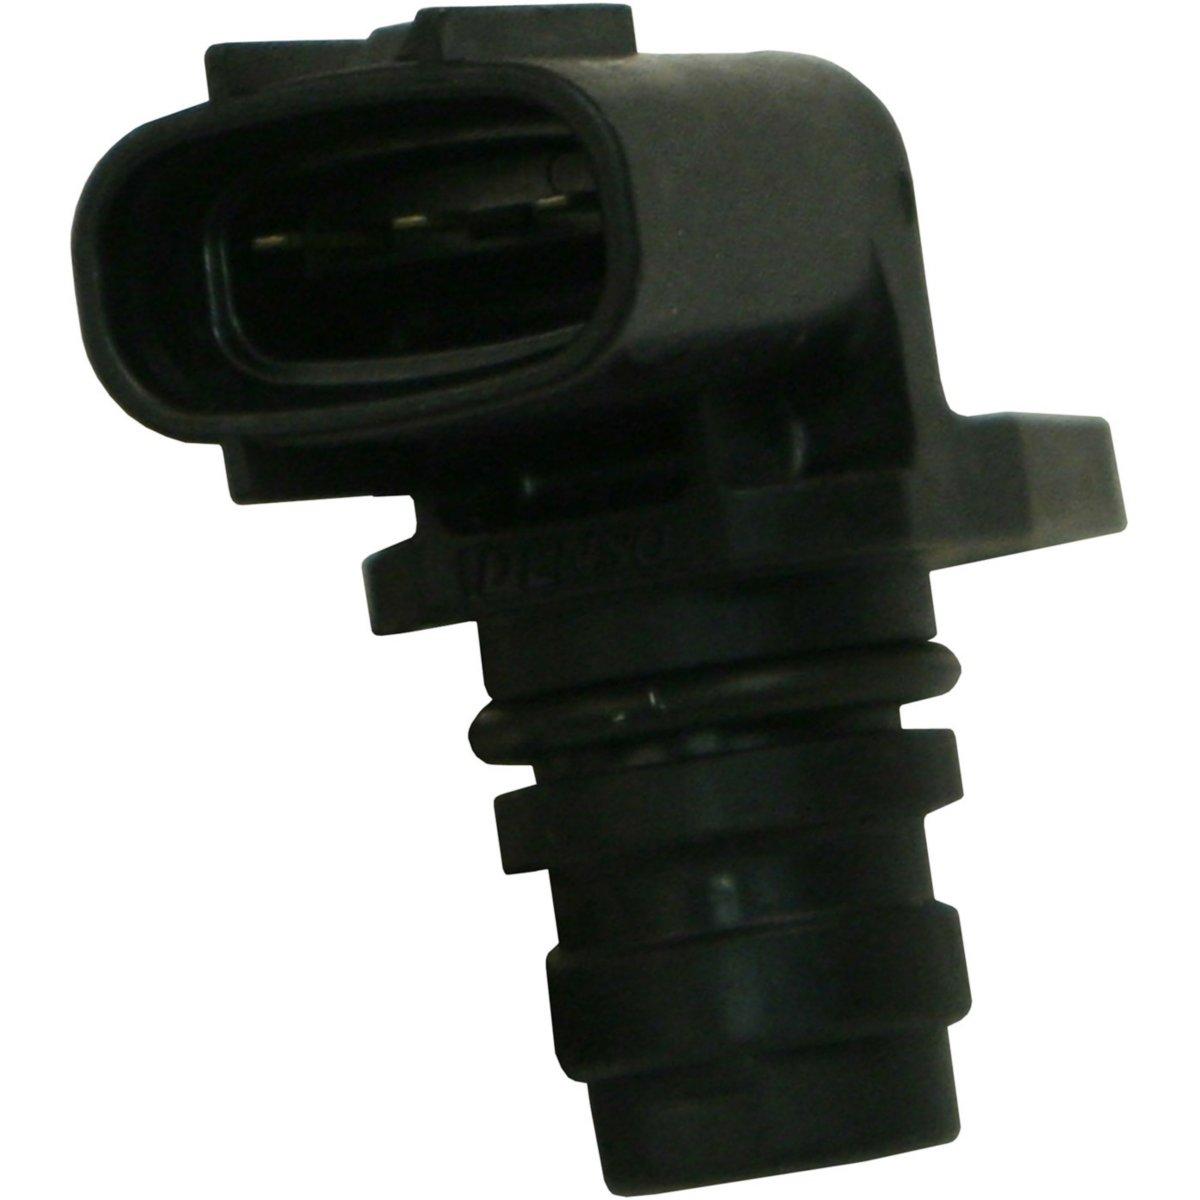 2003 Isuzu Axiom Camshaft: Beck Arnley Camshaft Position Sensor New Isuzu Rodeo Axiom